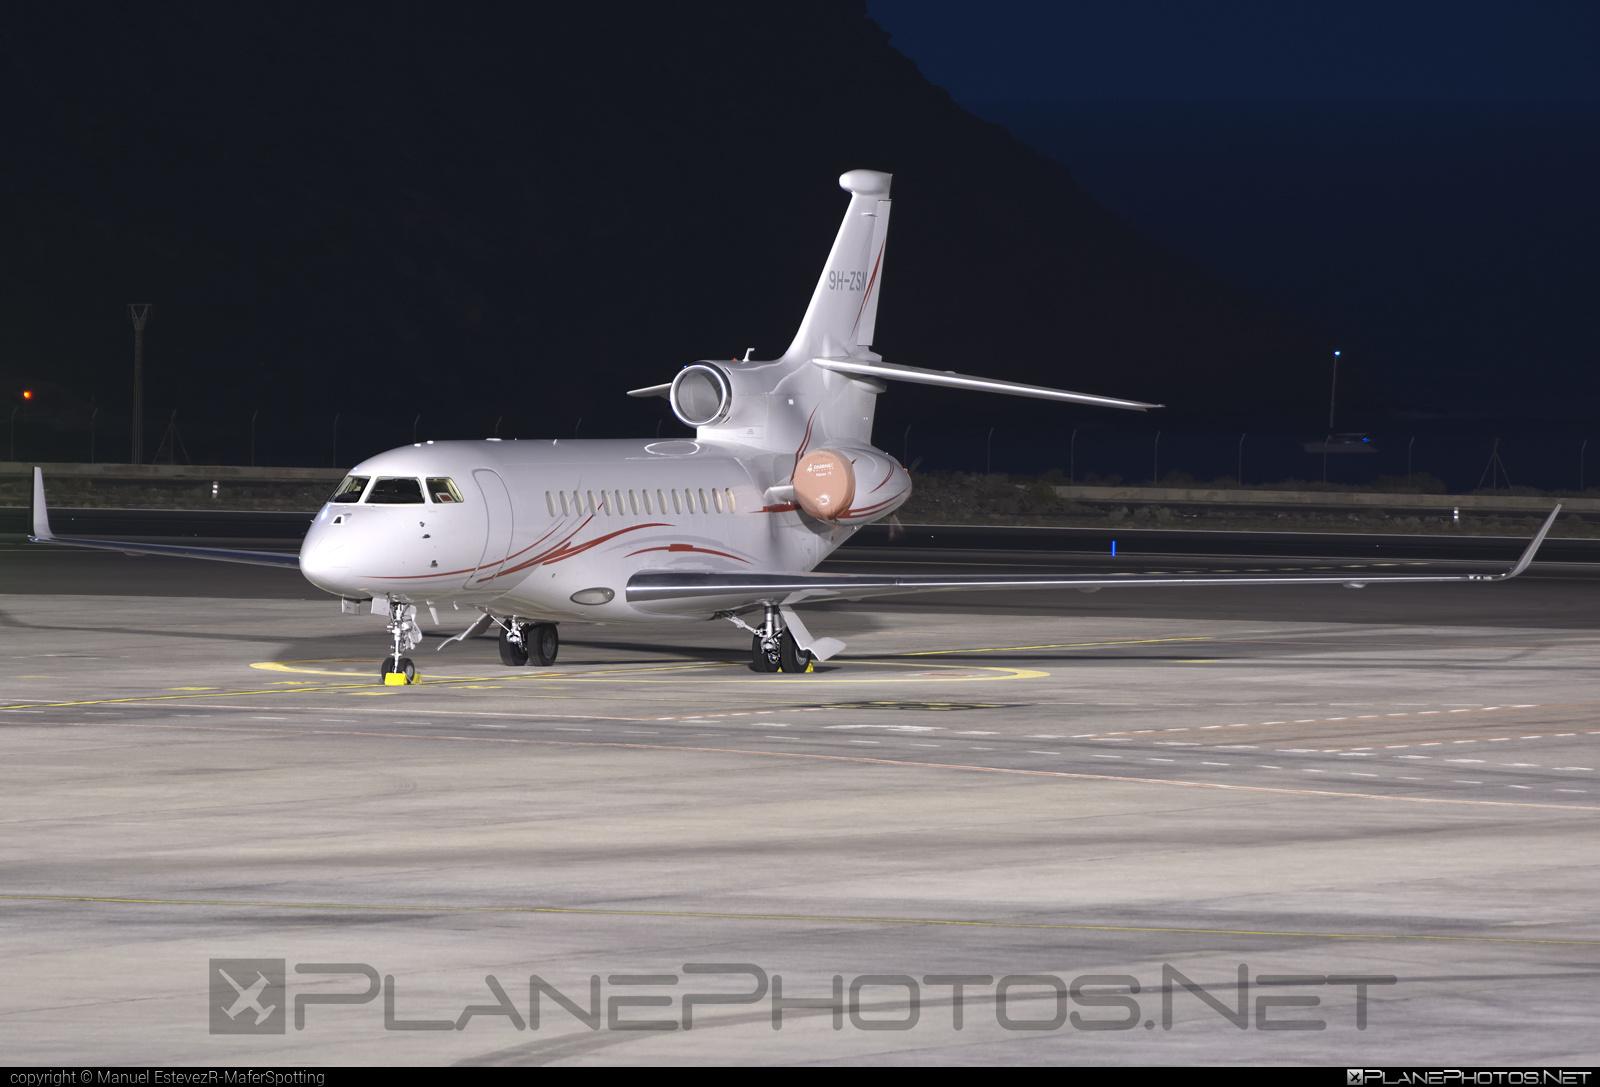 Dassault Falcon 7X - 9H-ZSN operated by Elit´Avia Malta Ltd. #dassault #dassaultfalcon #dassaultfalcon7x #falcon7x